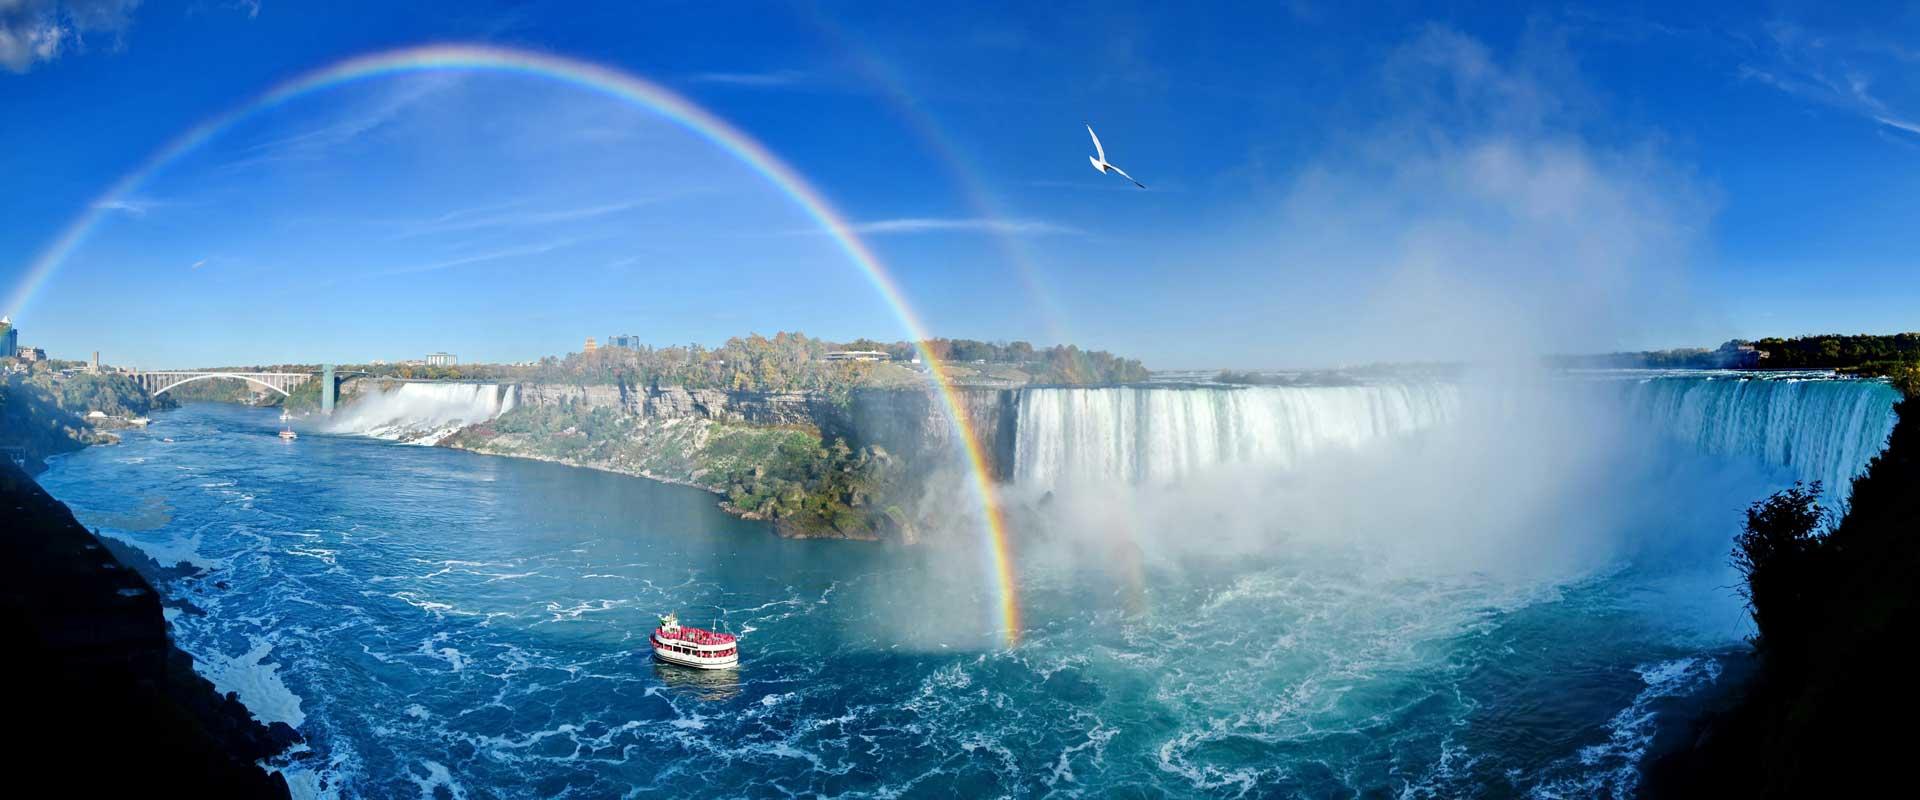 Travelling To Niagara Falls Ontario Canada Toniagara